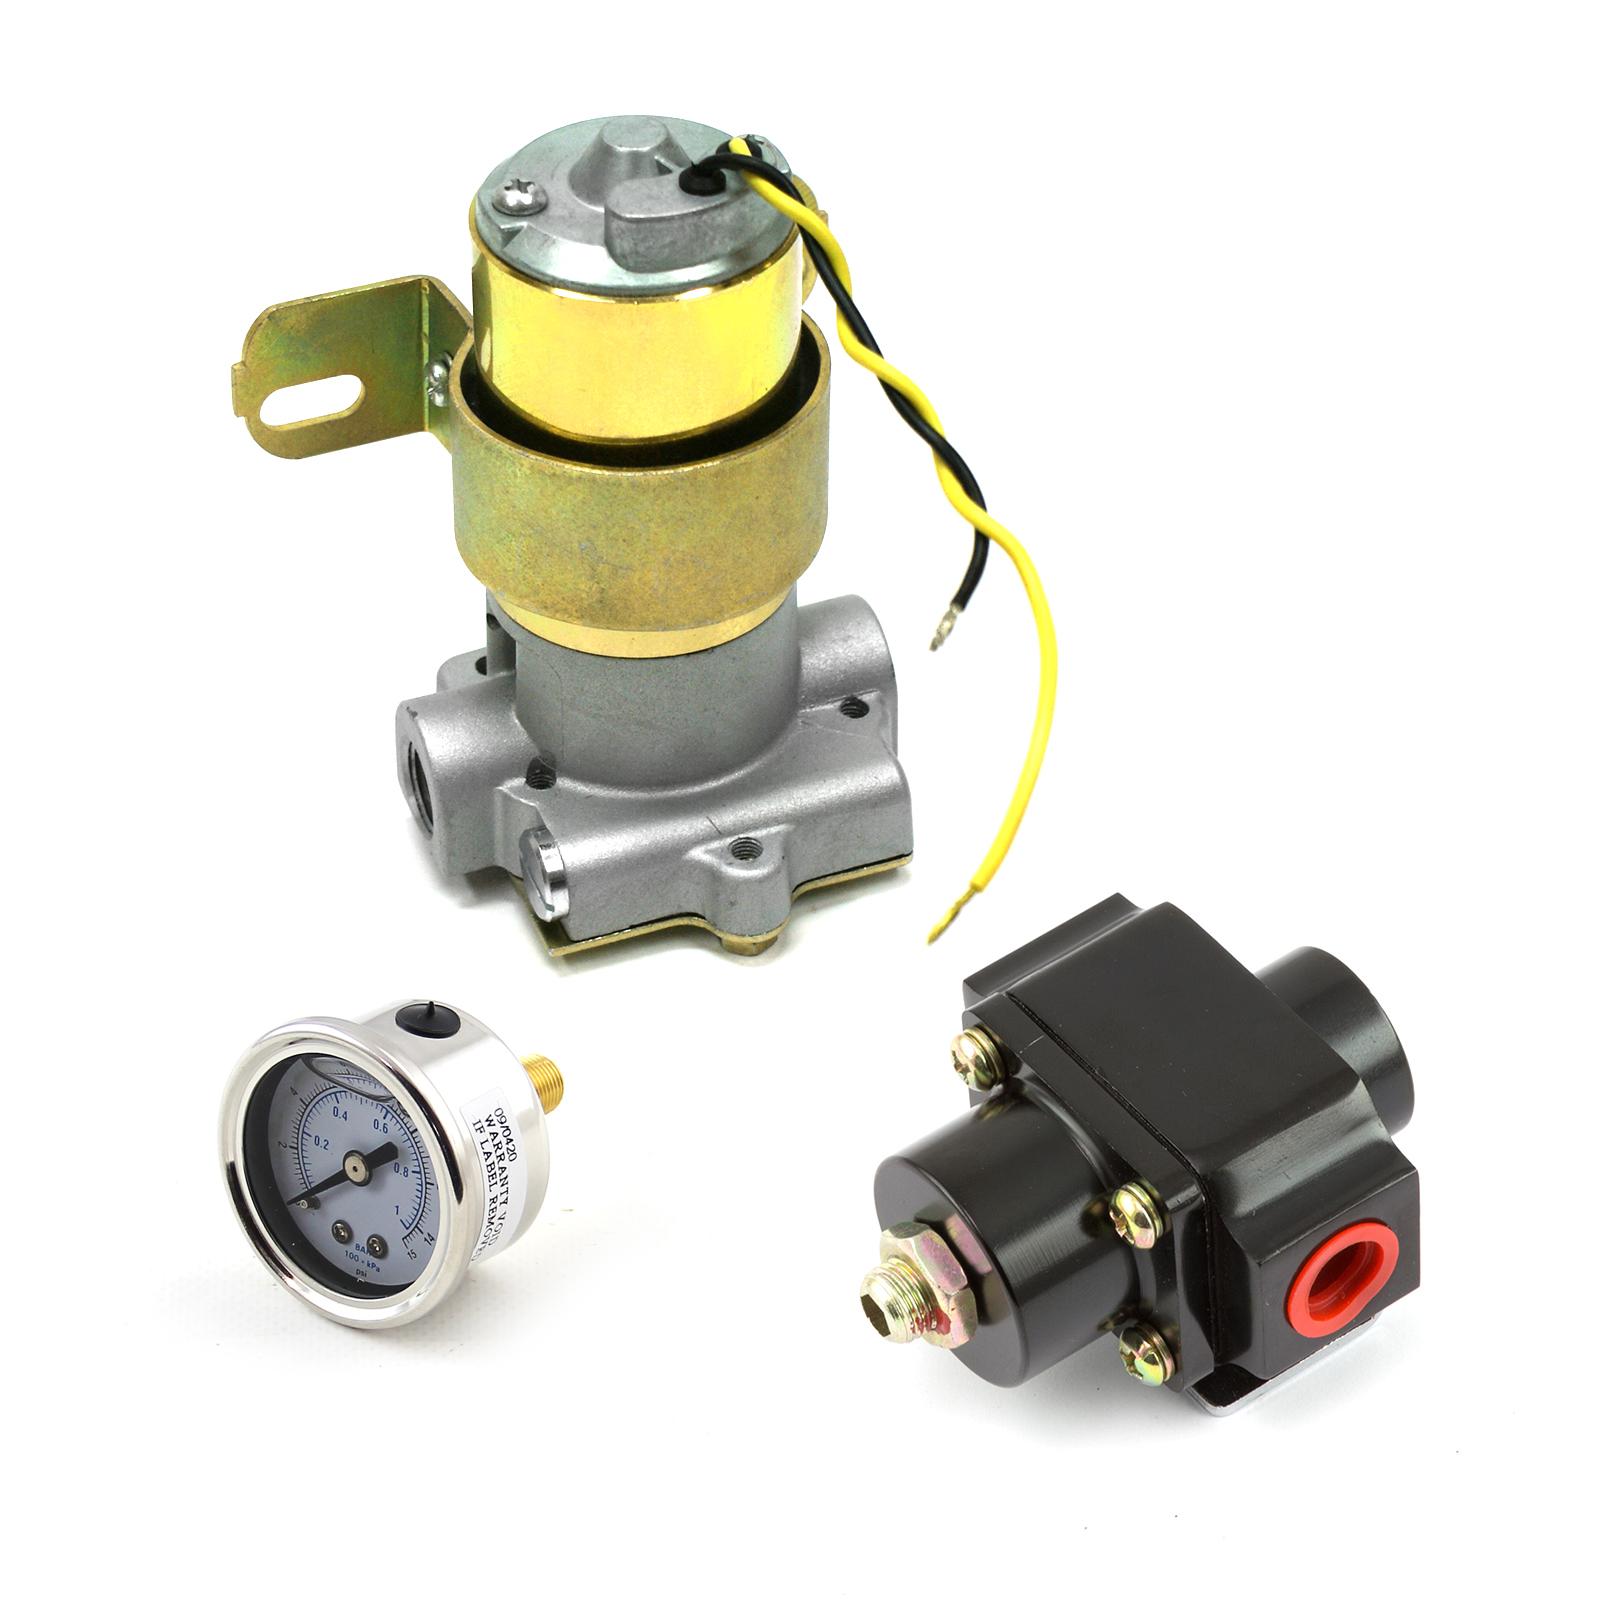 95 Gph Universal Electric Fuel Pump Black Regulator & Gauge Combo Kit